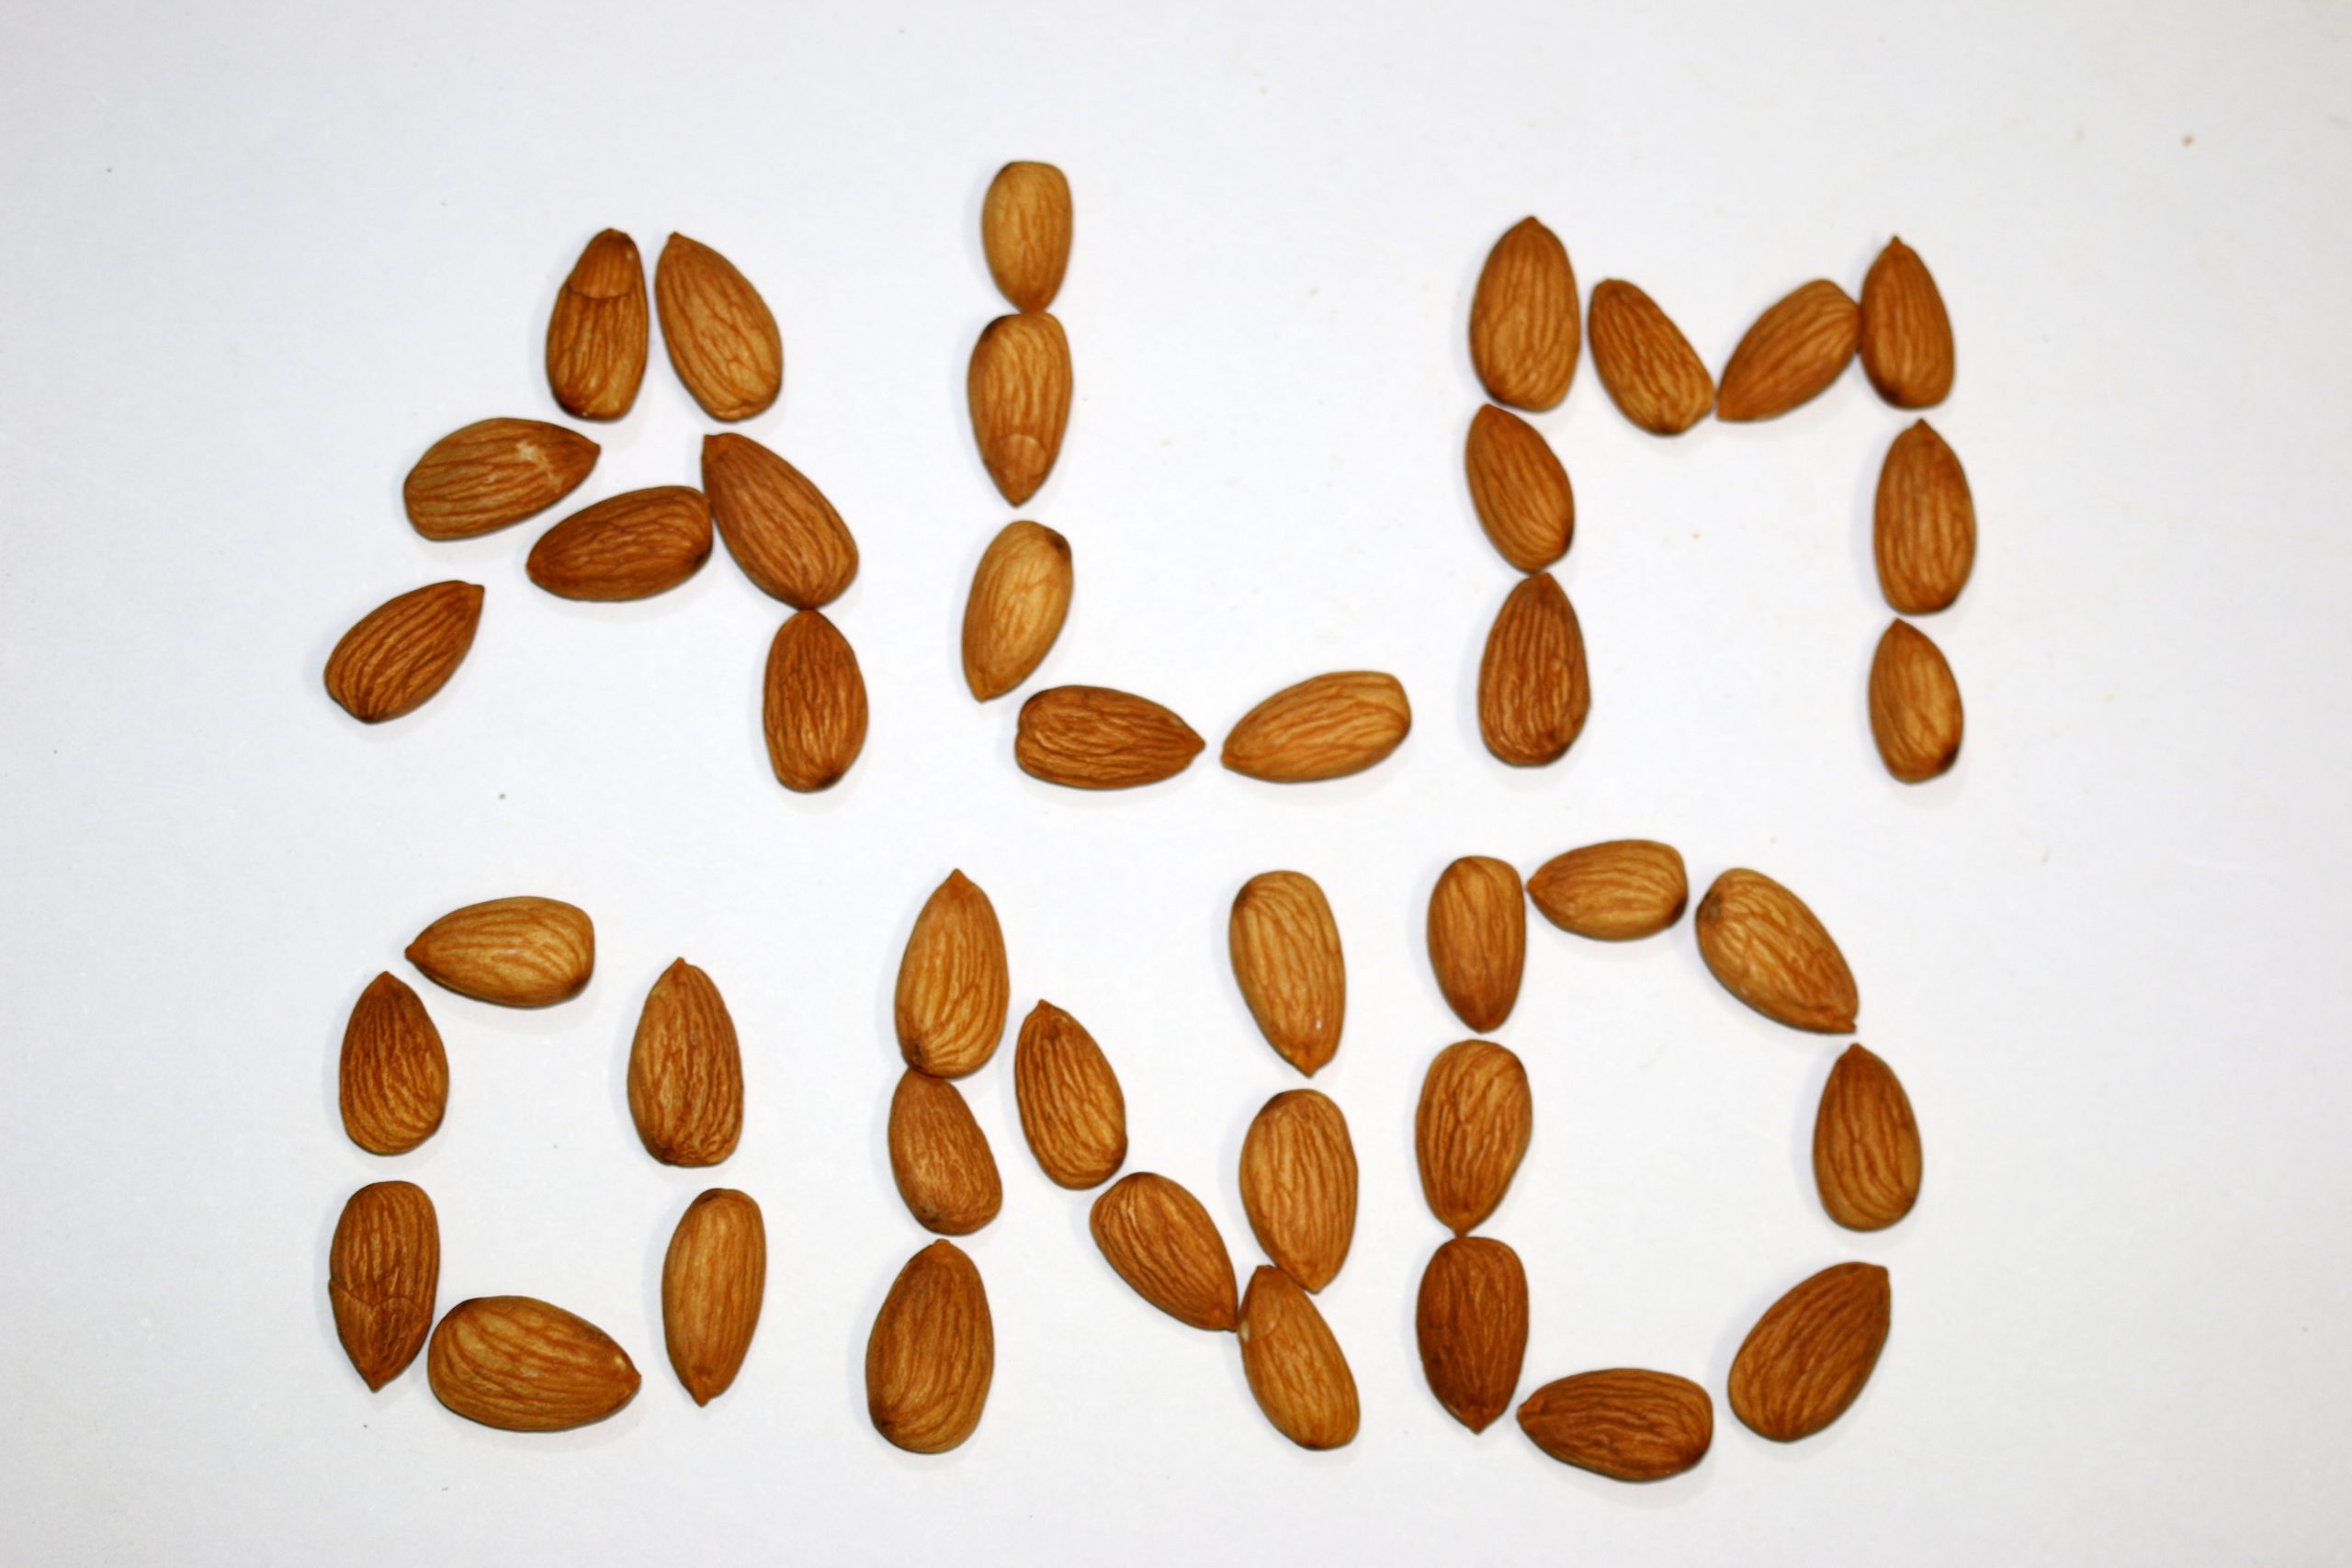 Almond word spelt using almonds